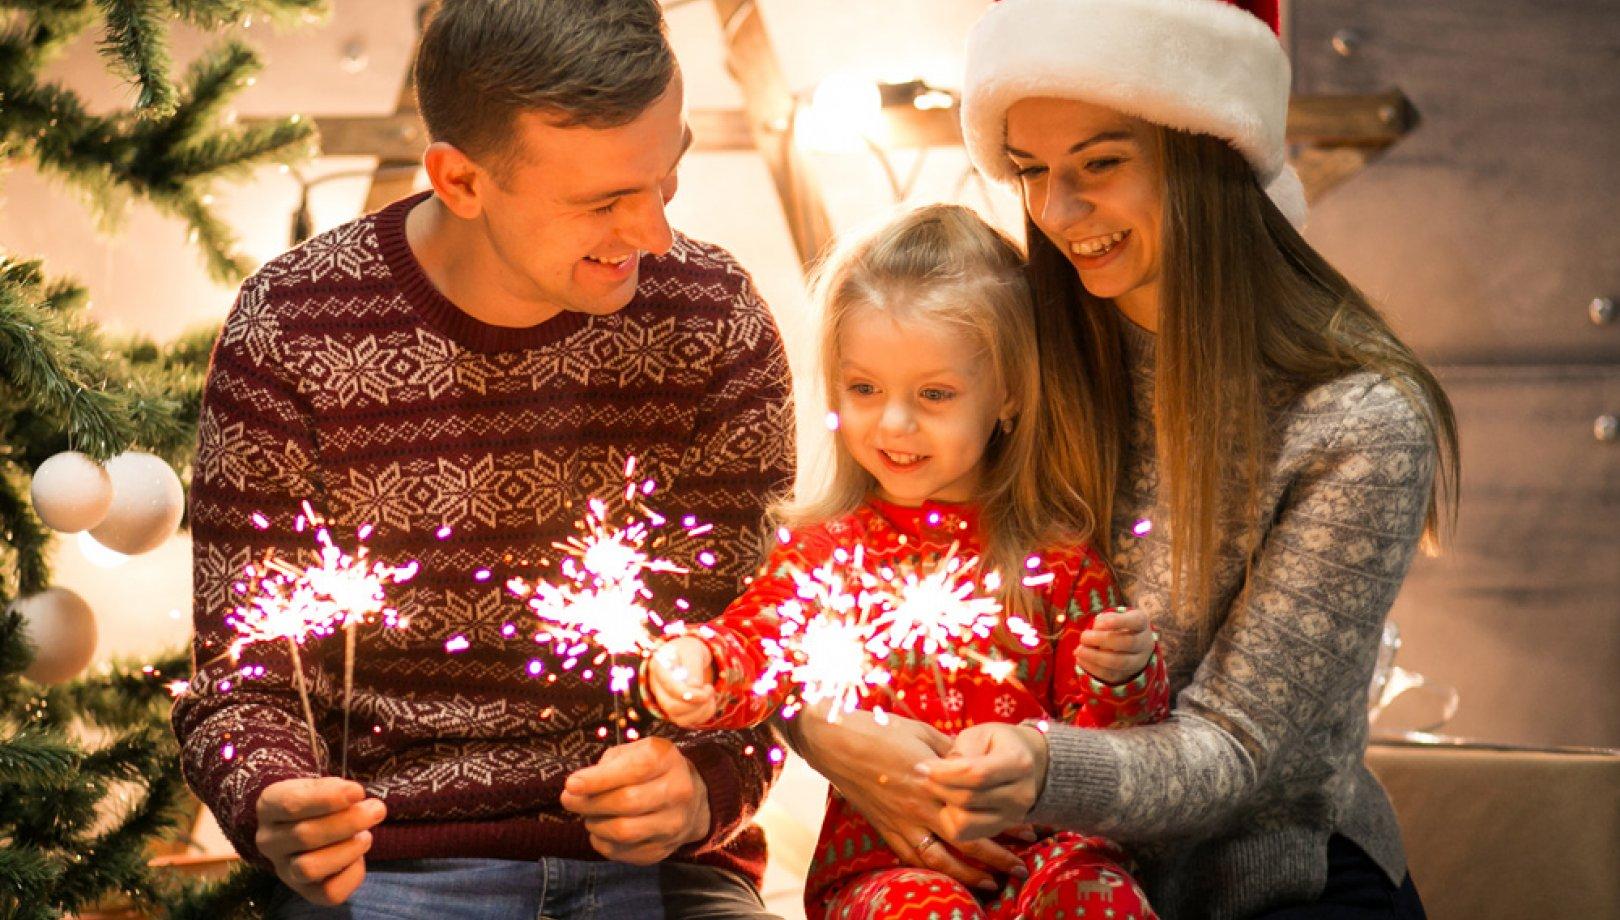 Careless Christmas Holidays with Stars